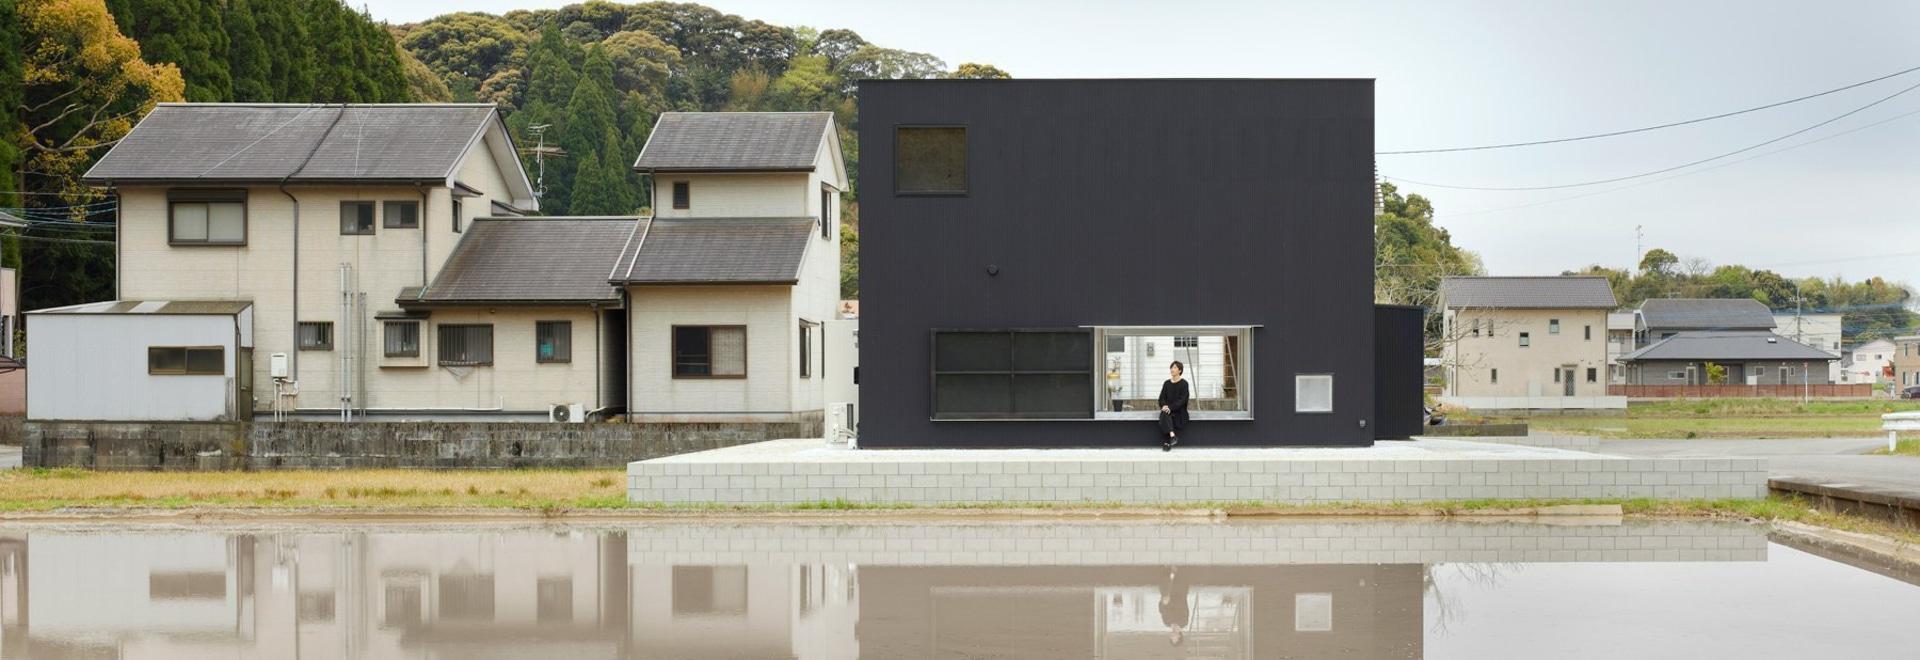 atelier kenta eto wraps cube house in black aluminum in kadokawa, japan